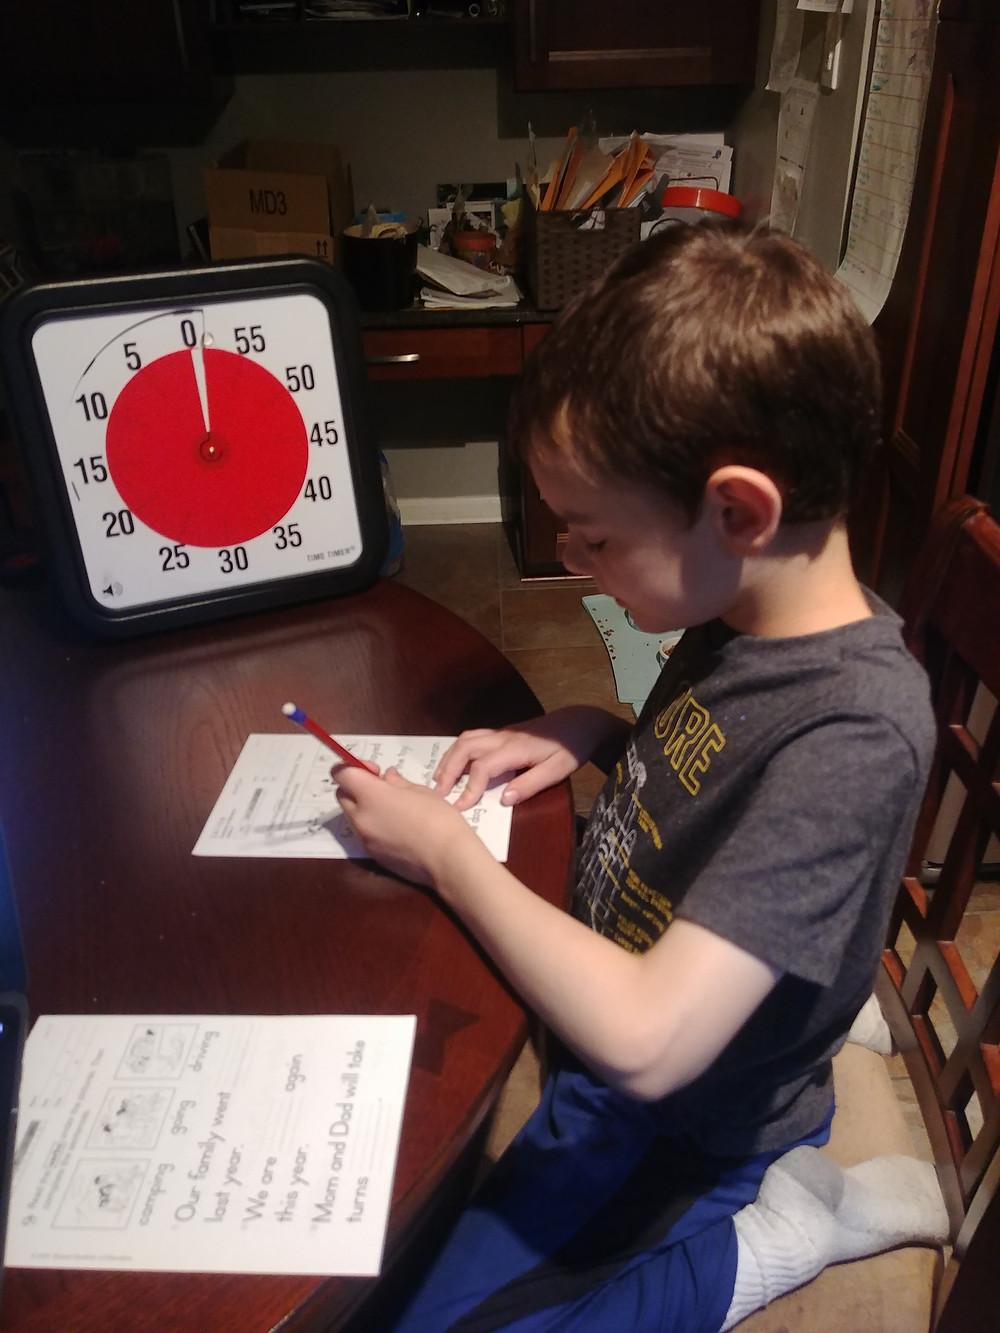 Boy next to a visual timing doing homework